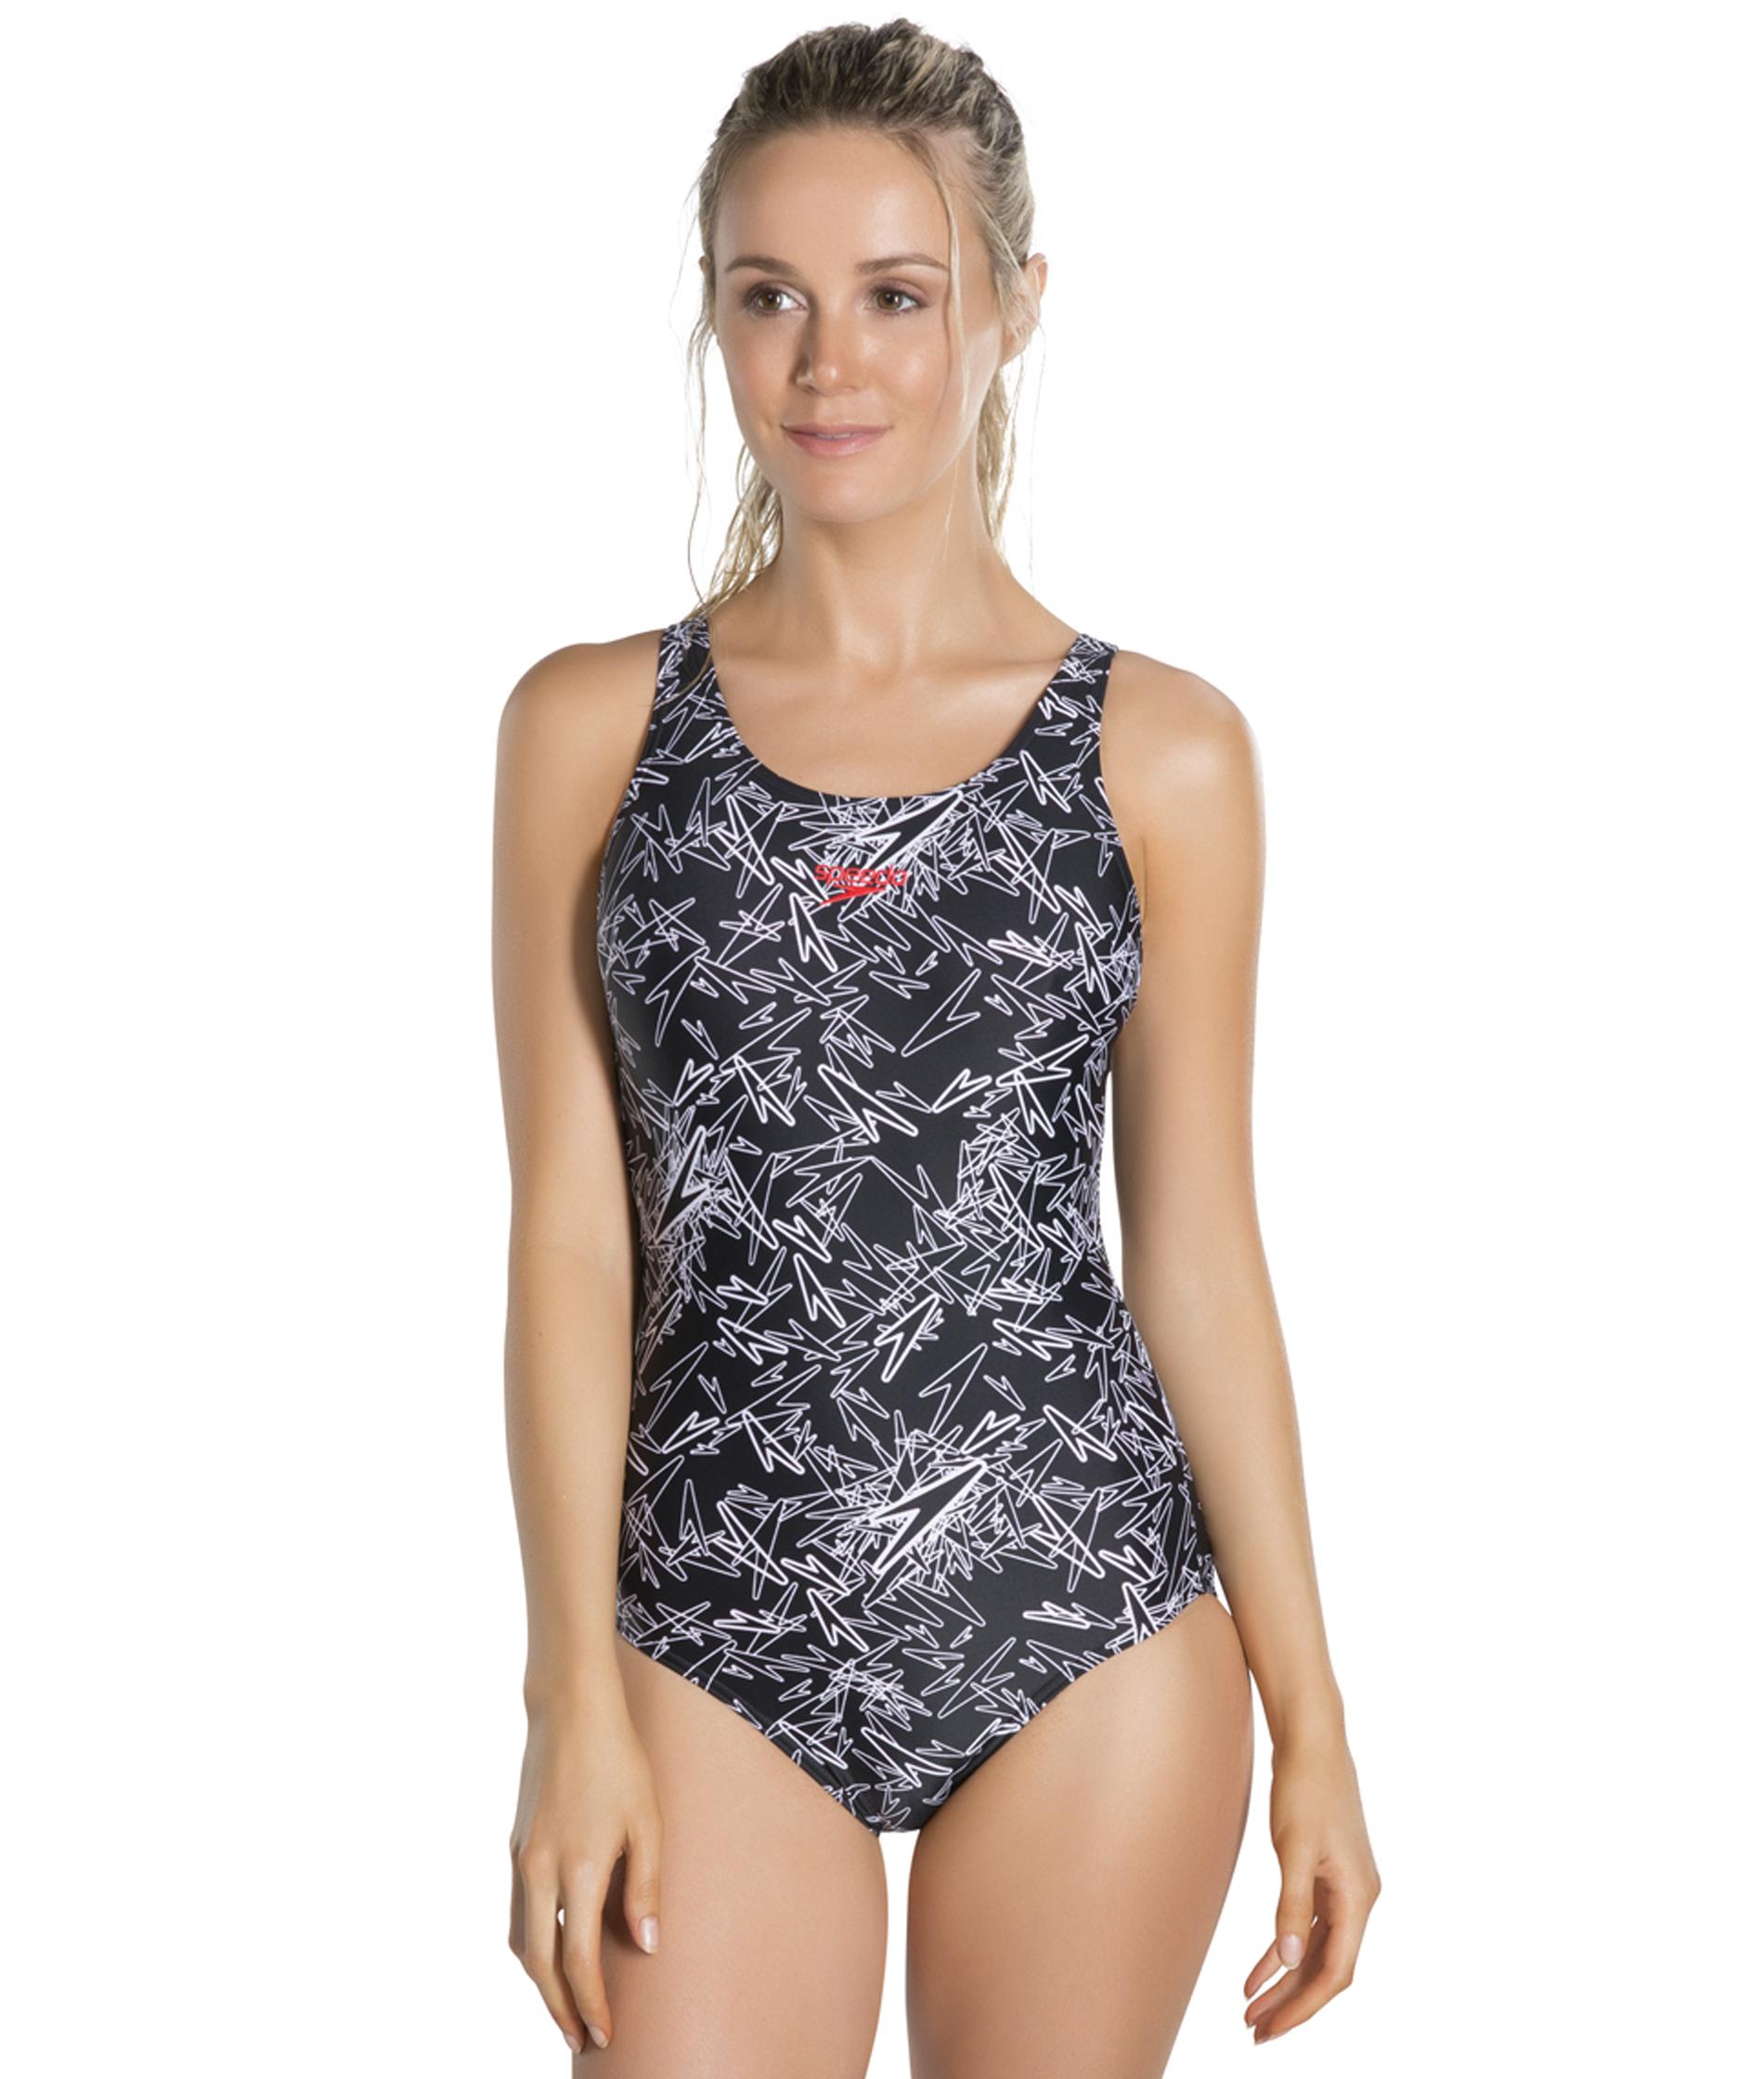 Speedo Ladies Boom Allover Muscleback Swimsuit - Blk/White